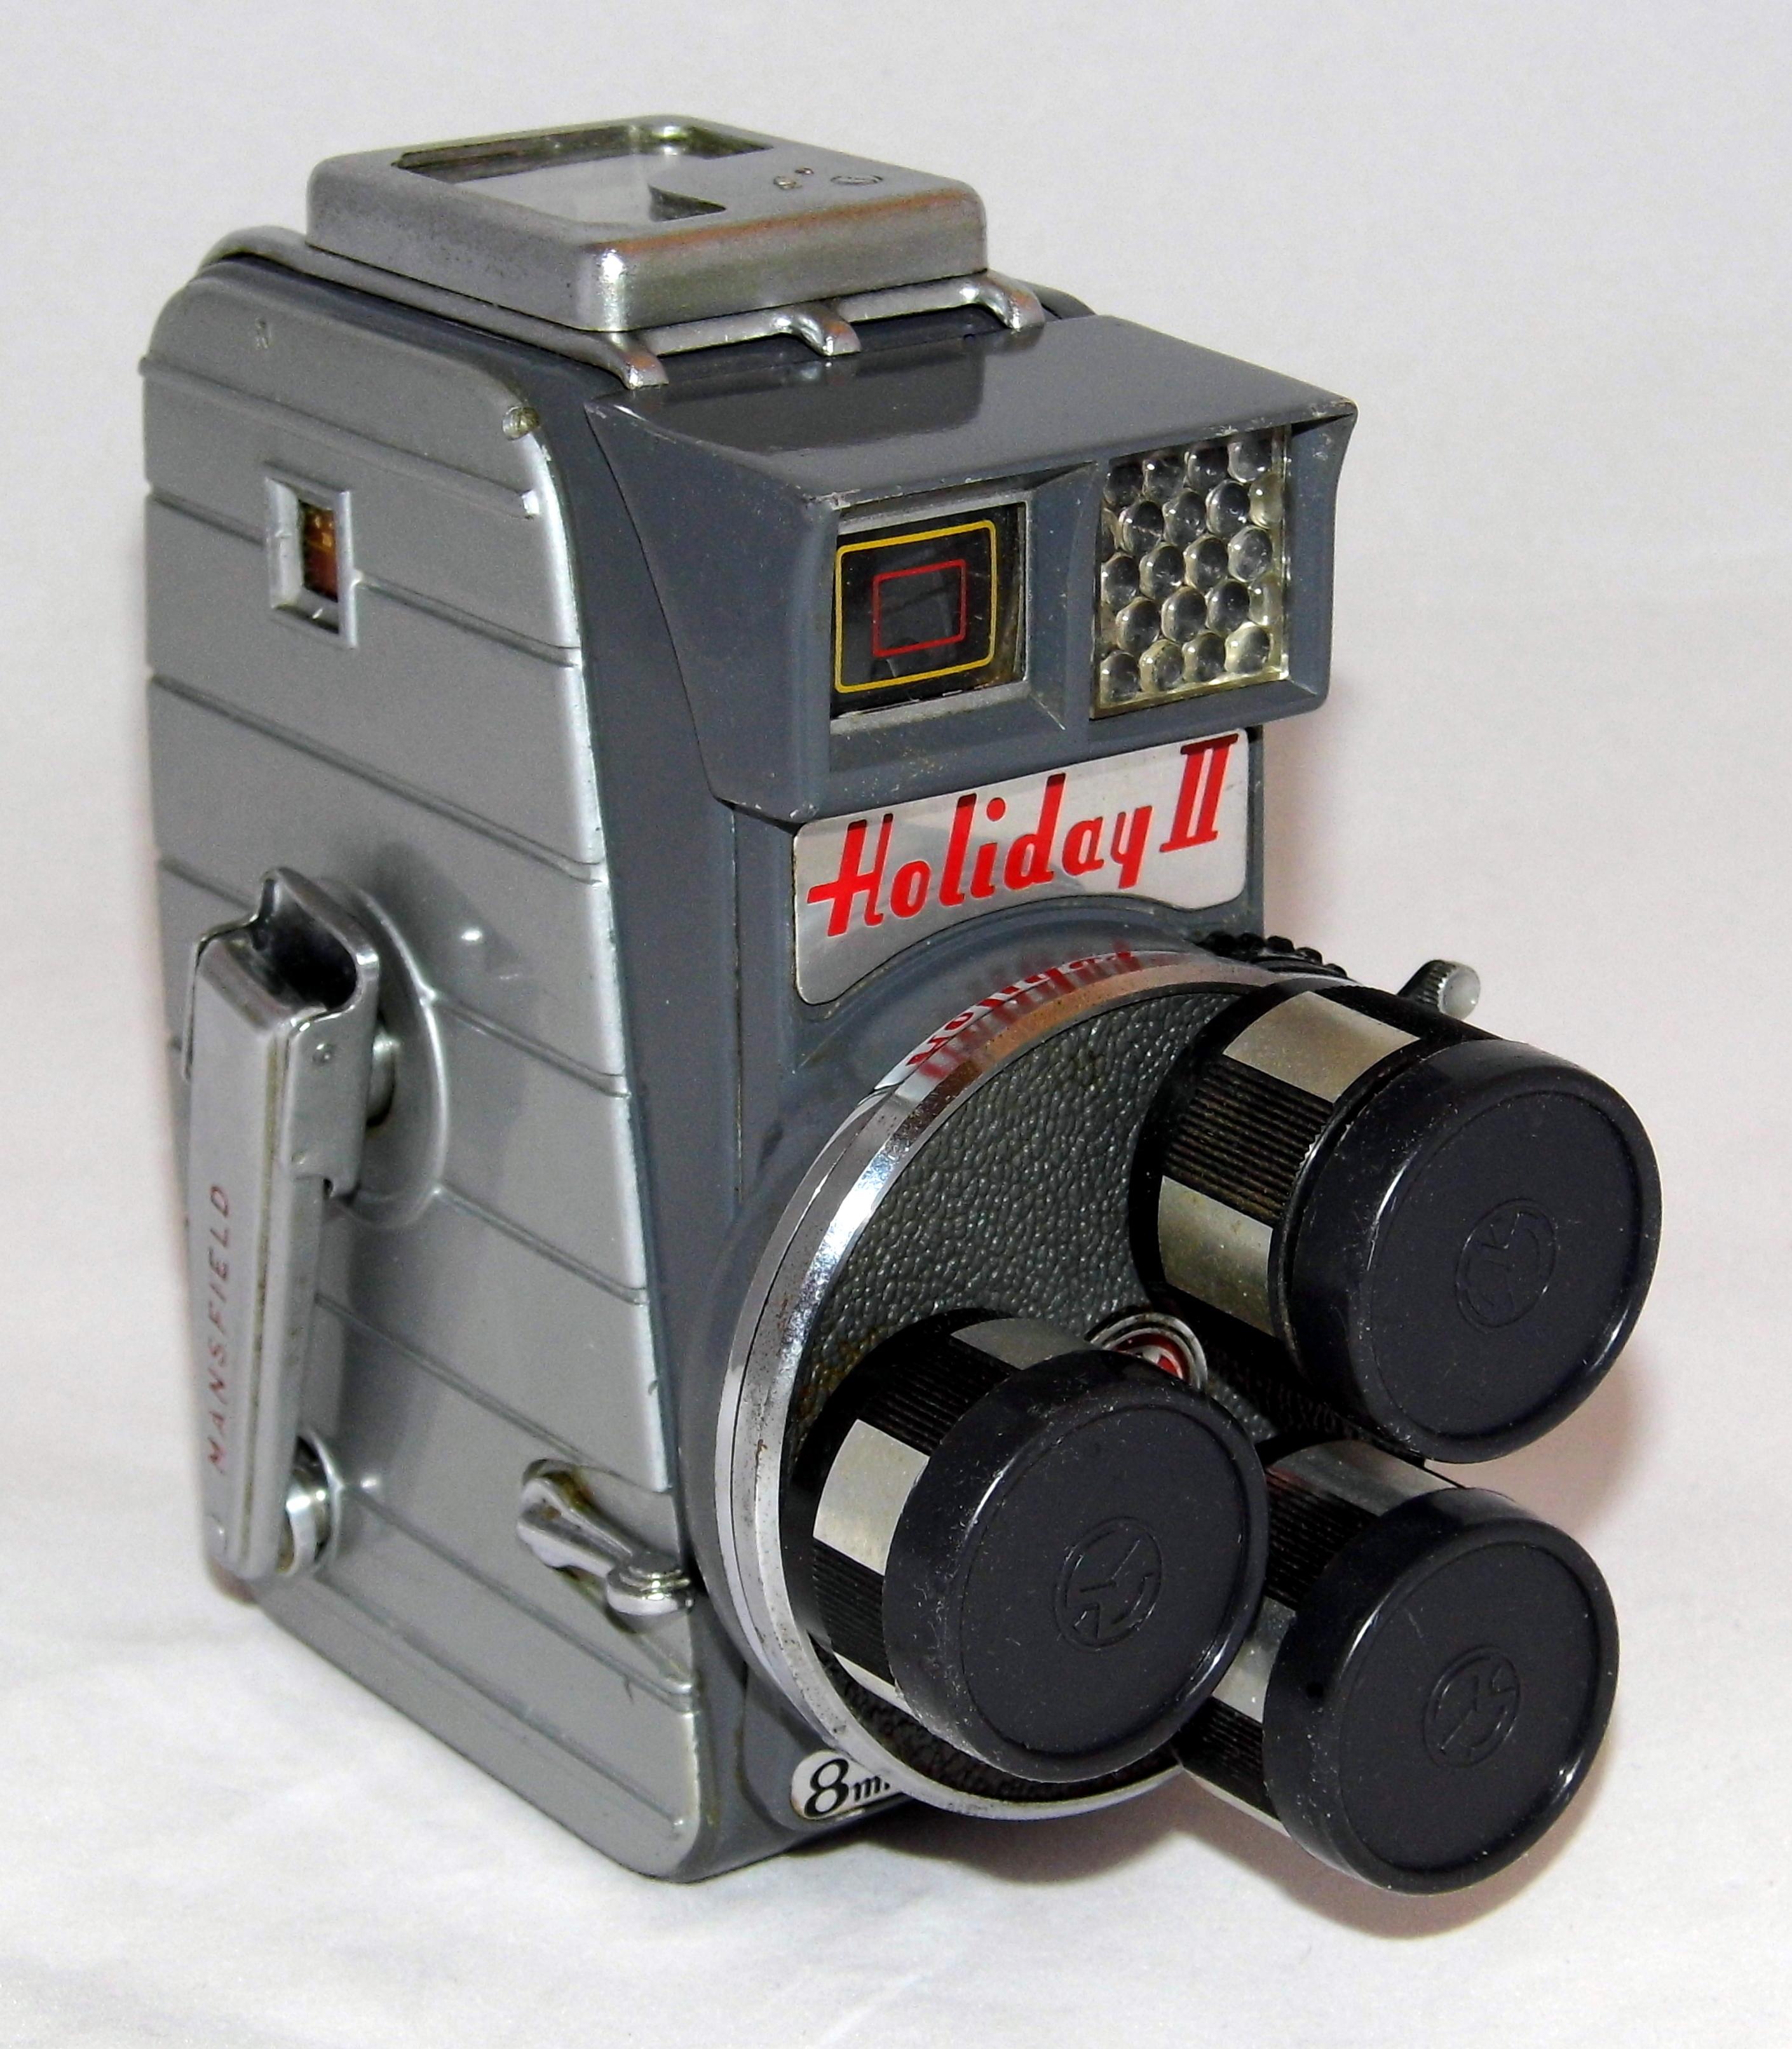 8Mm Vintage Camera file:vintage mansfield holiday ii 8mm triple turret lens